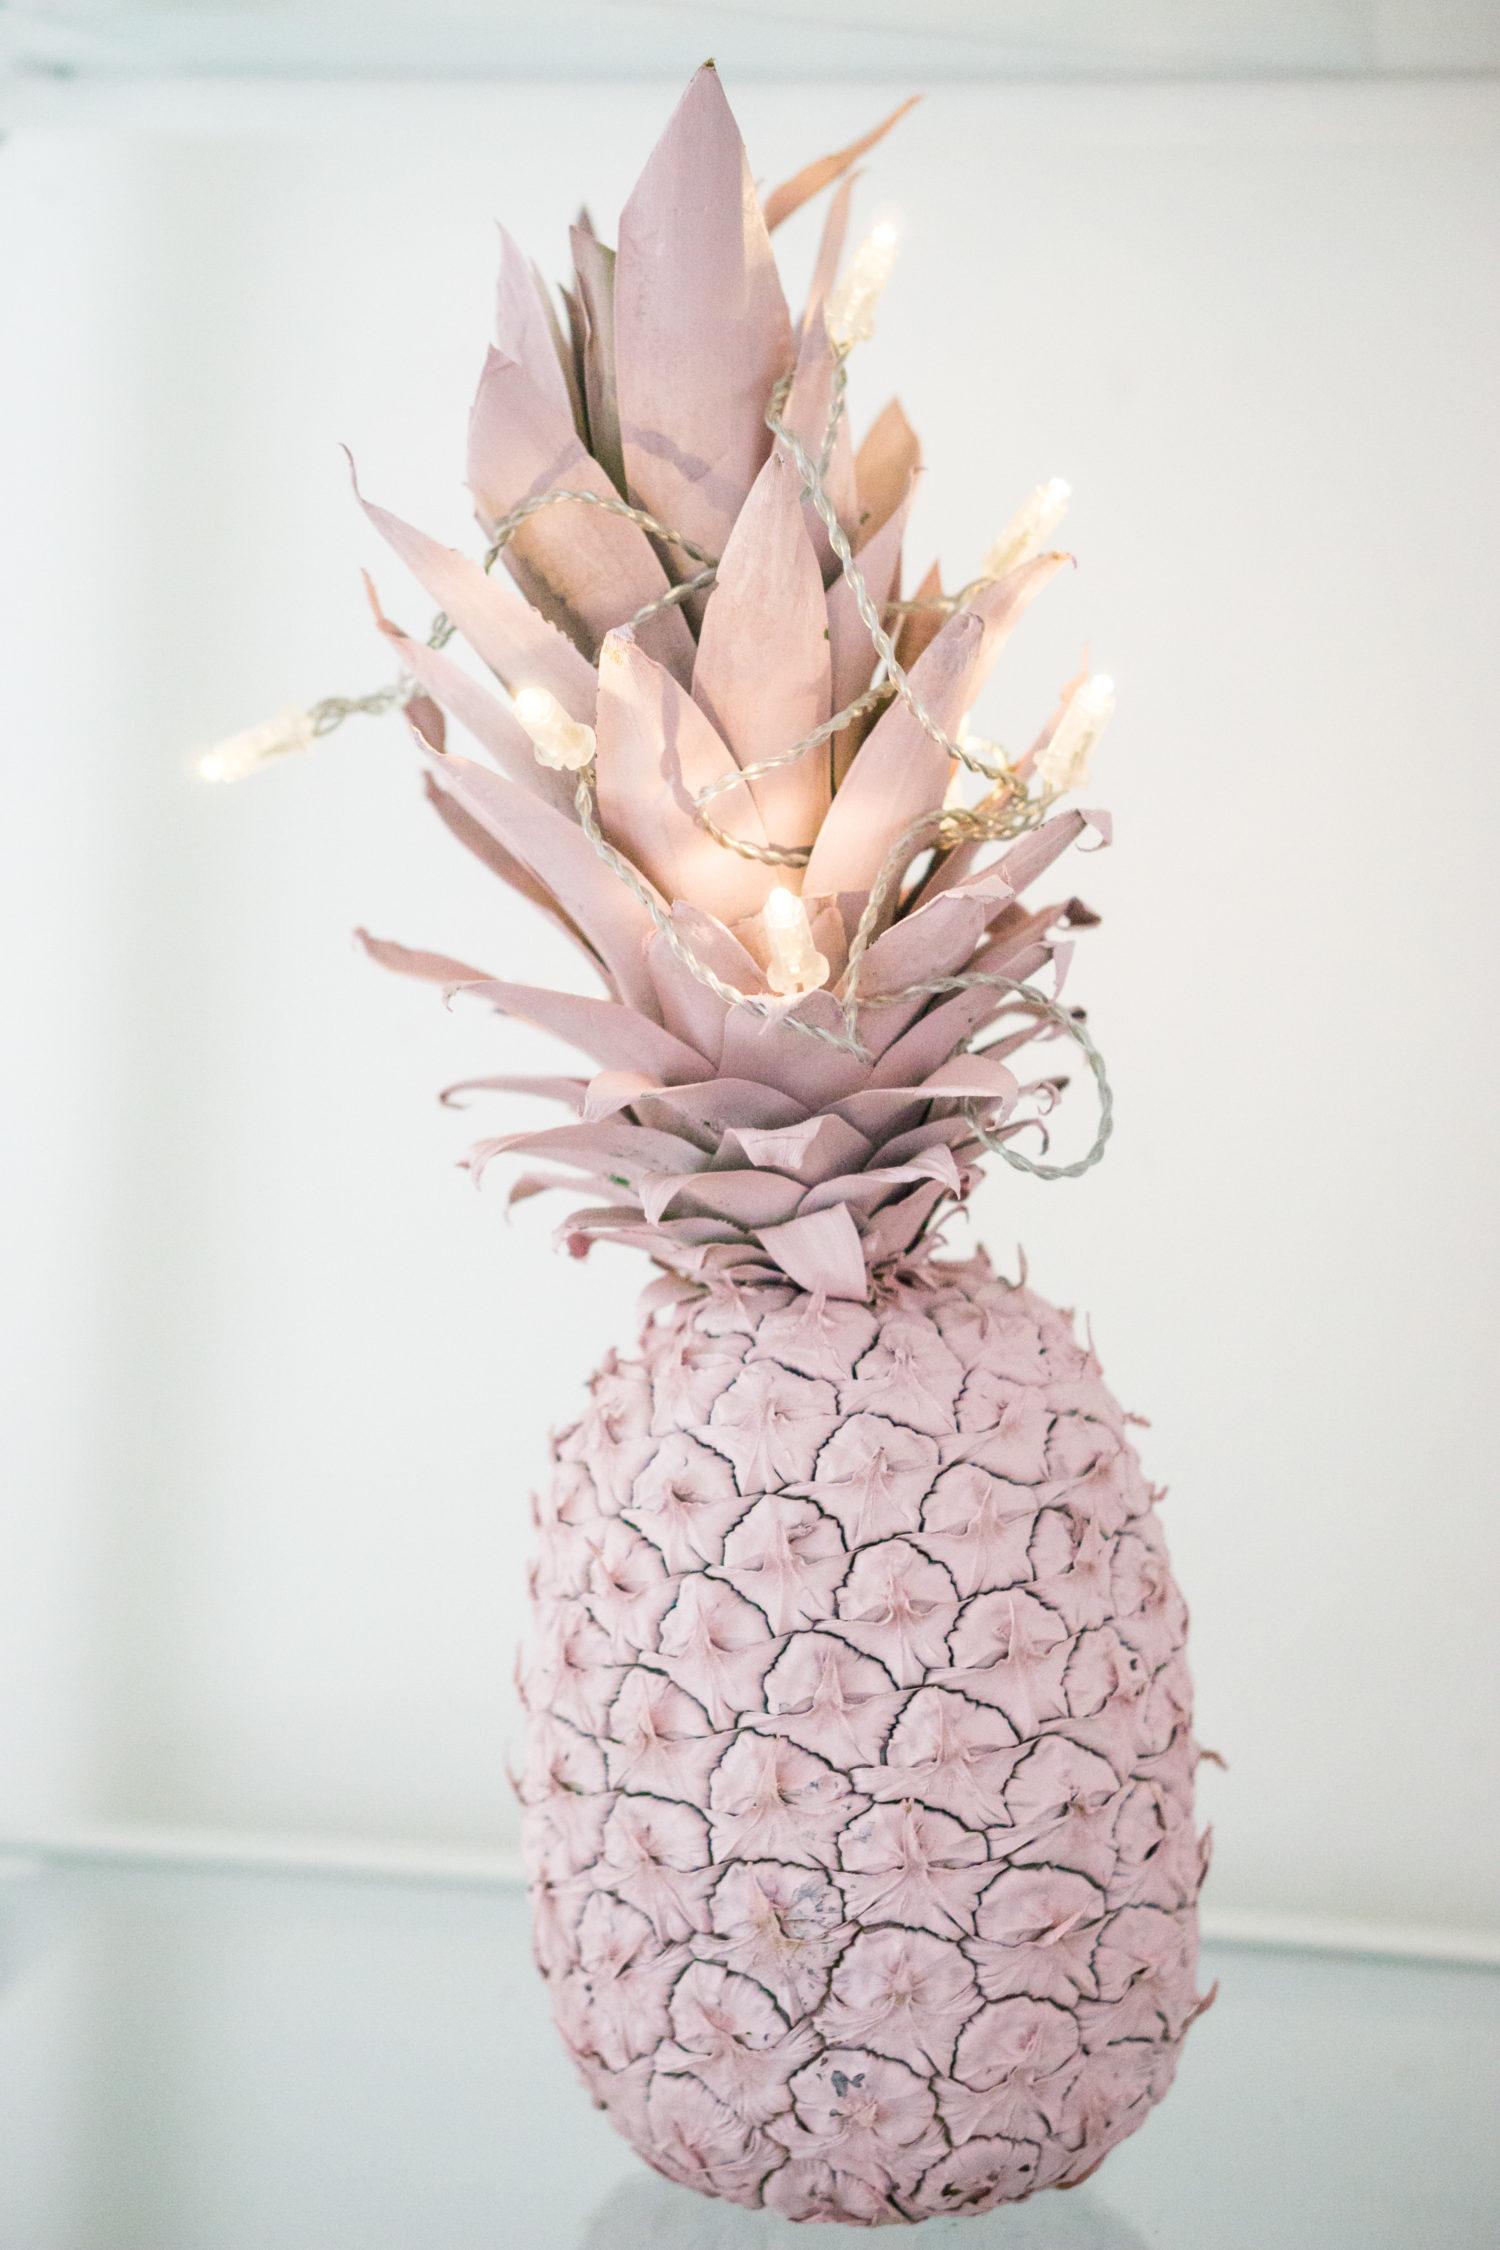 DIY painted pineapple decor idea